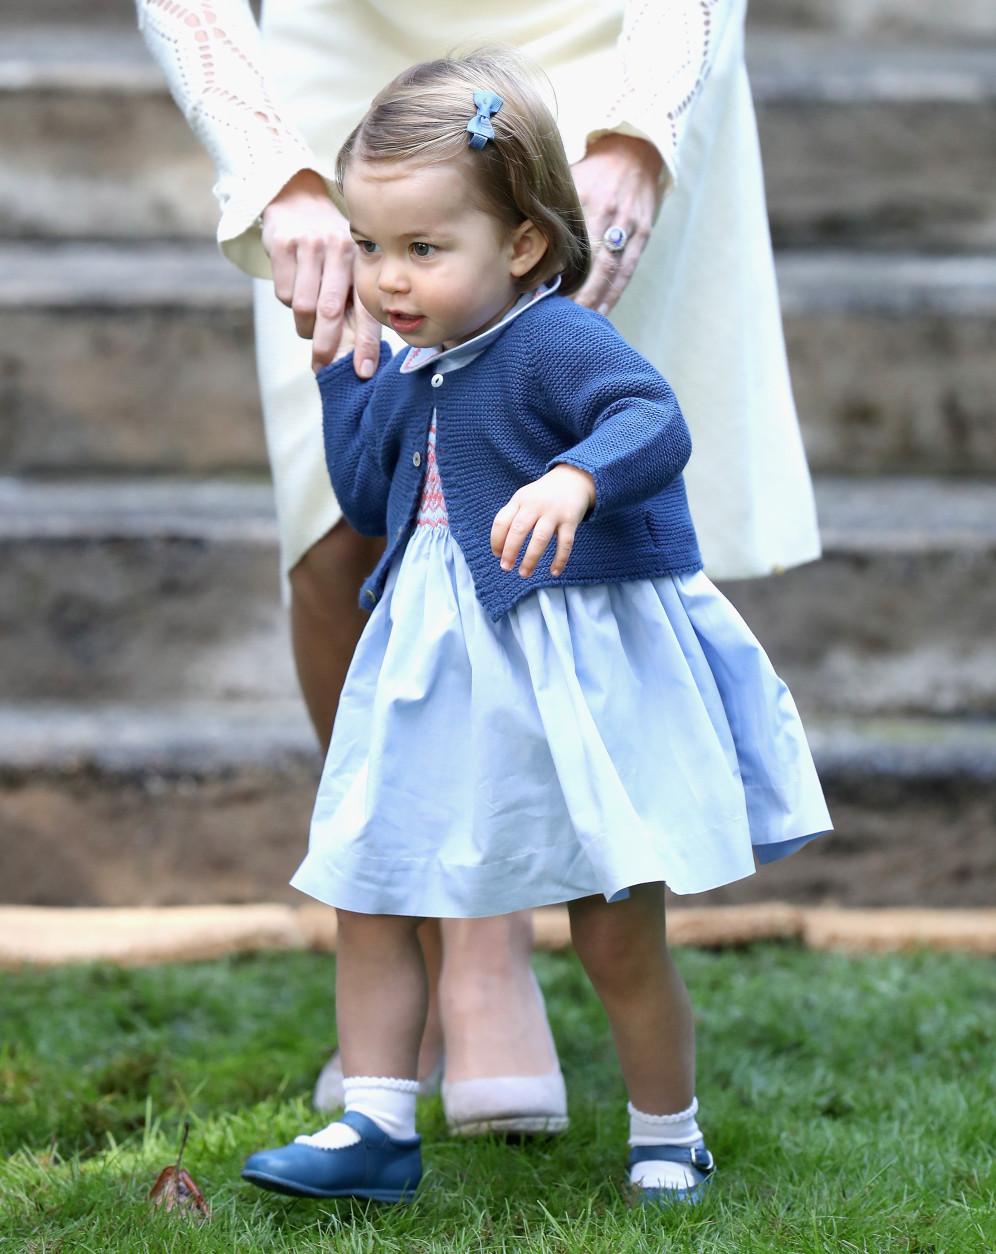 تشارلوت ترتدى فستان سماوي